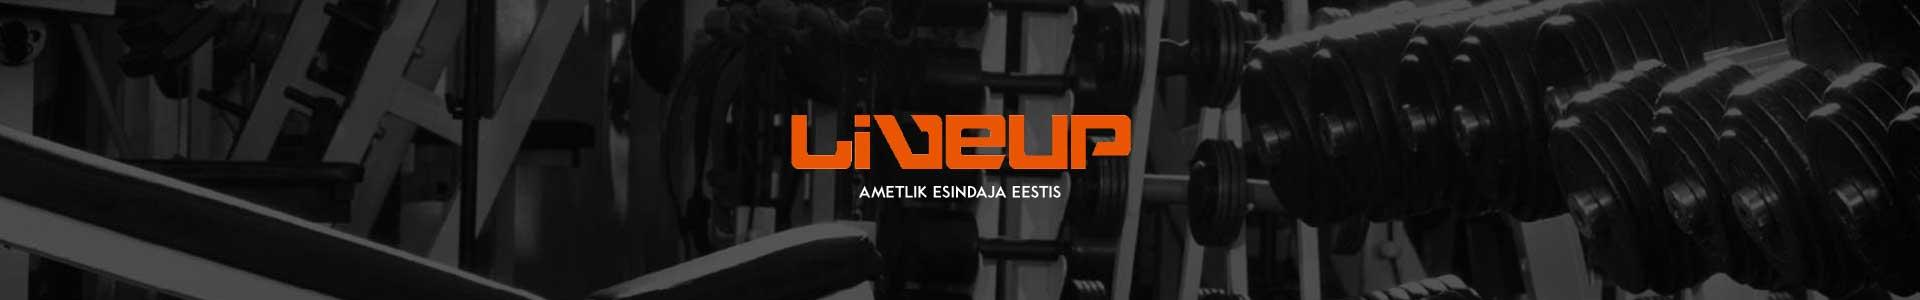 Budopunkt – Liveup Fitness Eesti